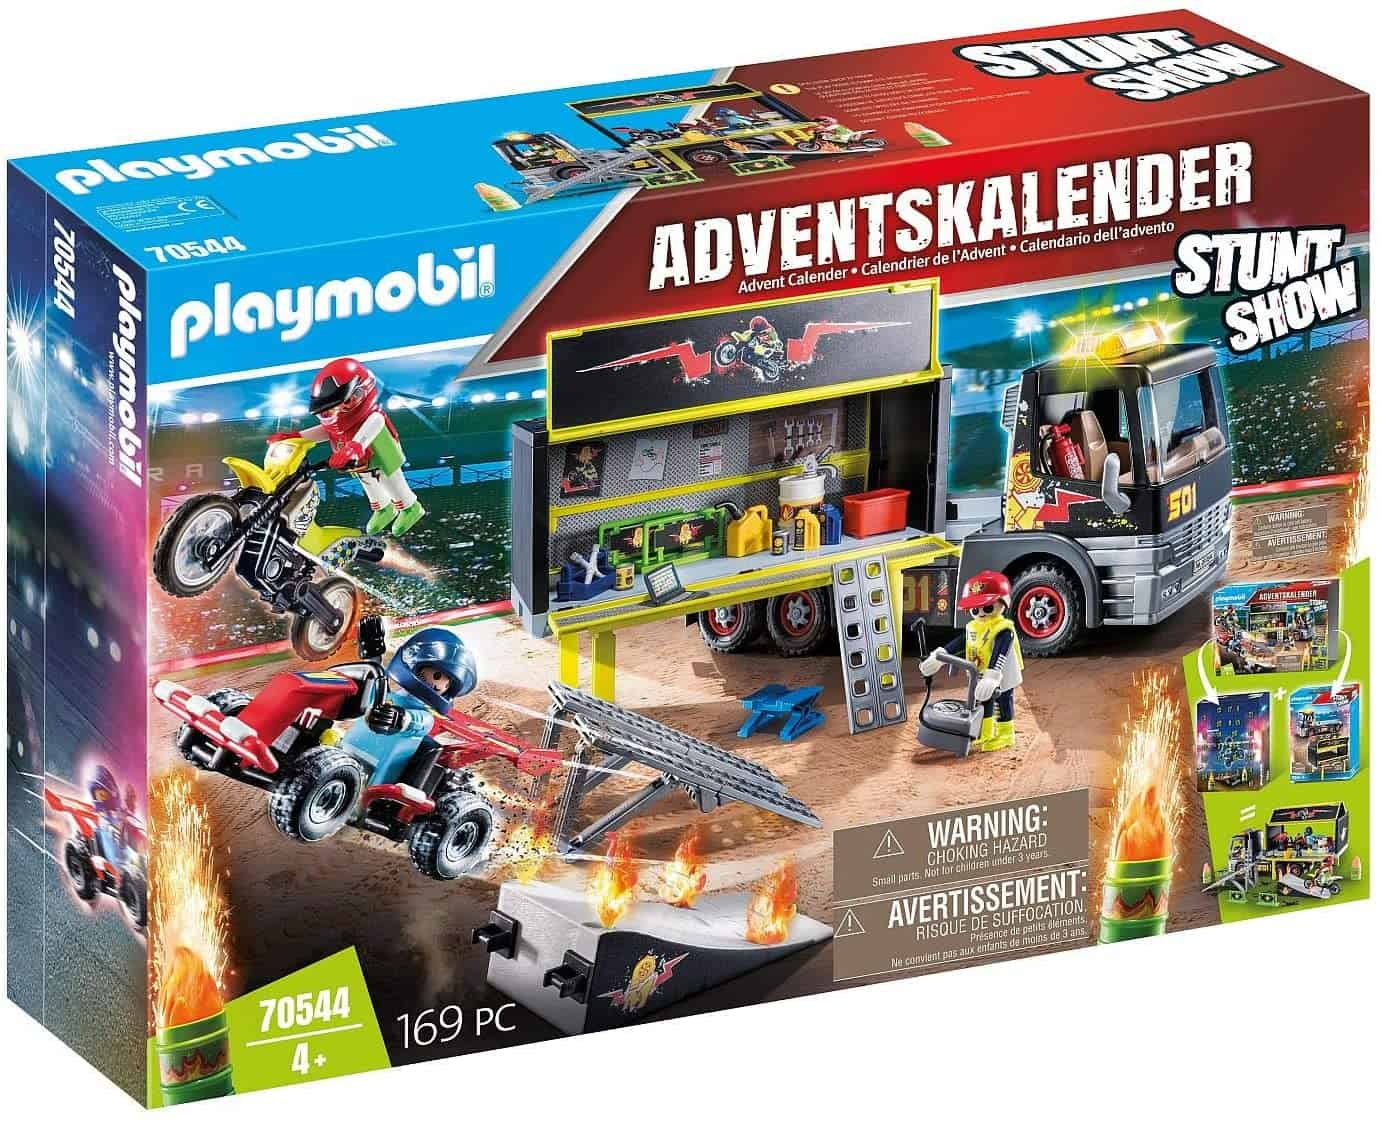 PLAYMOBIL-XXL-Adventskalender-70544-Stuntshow